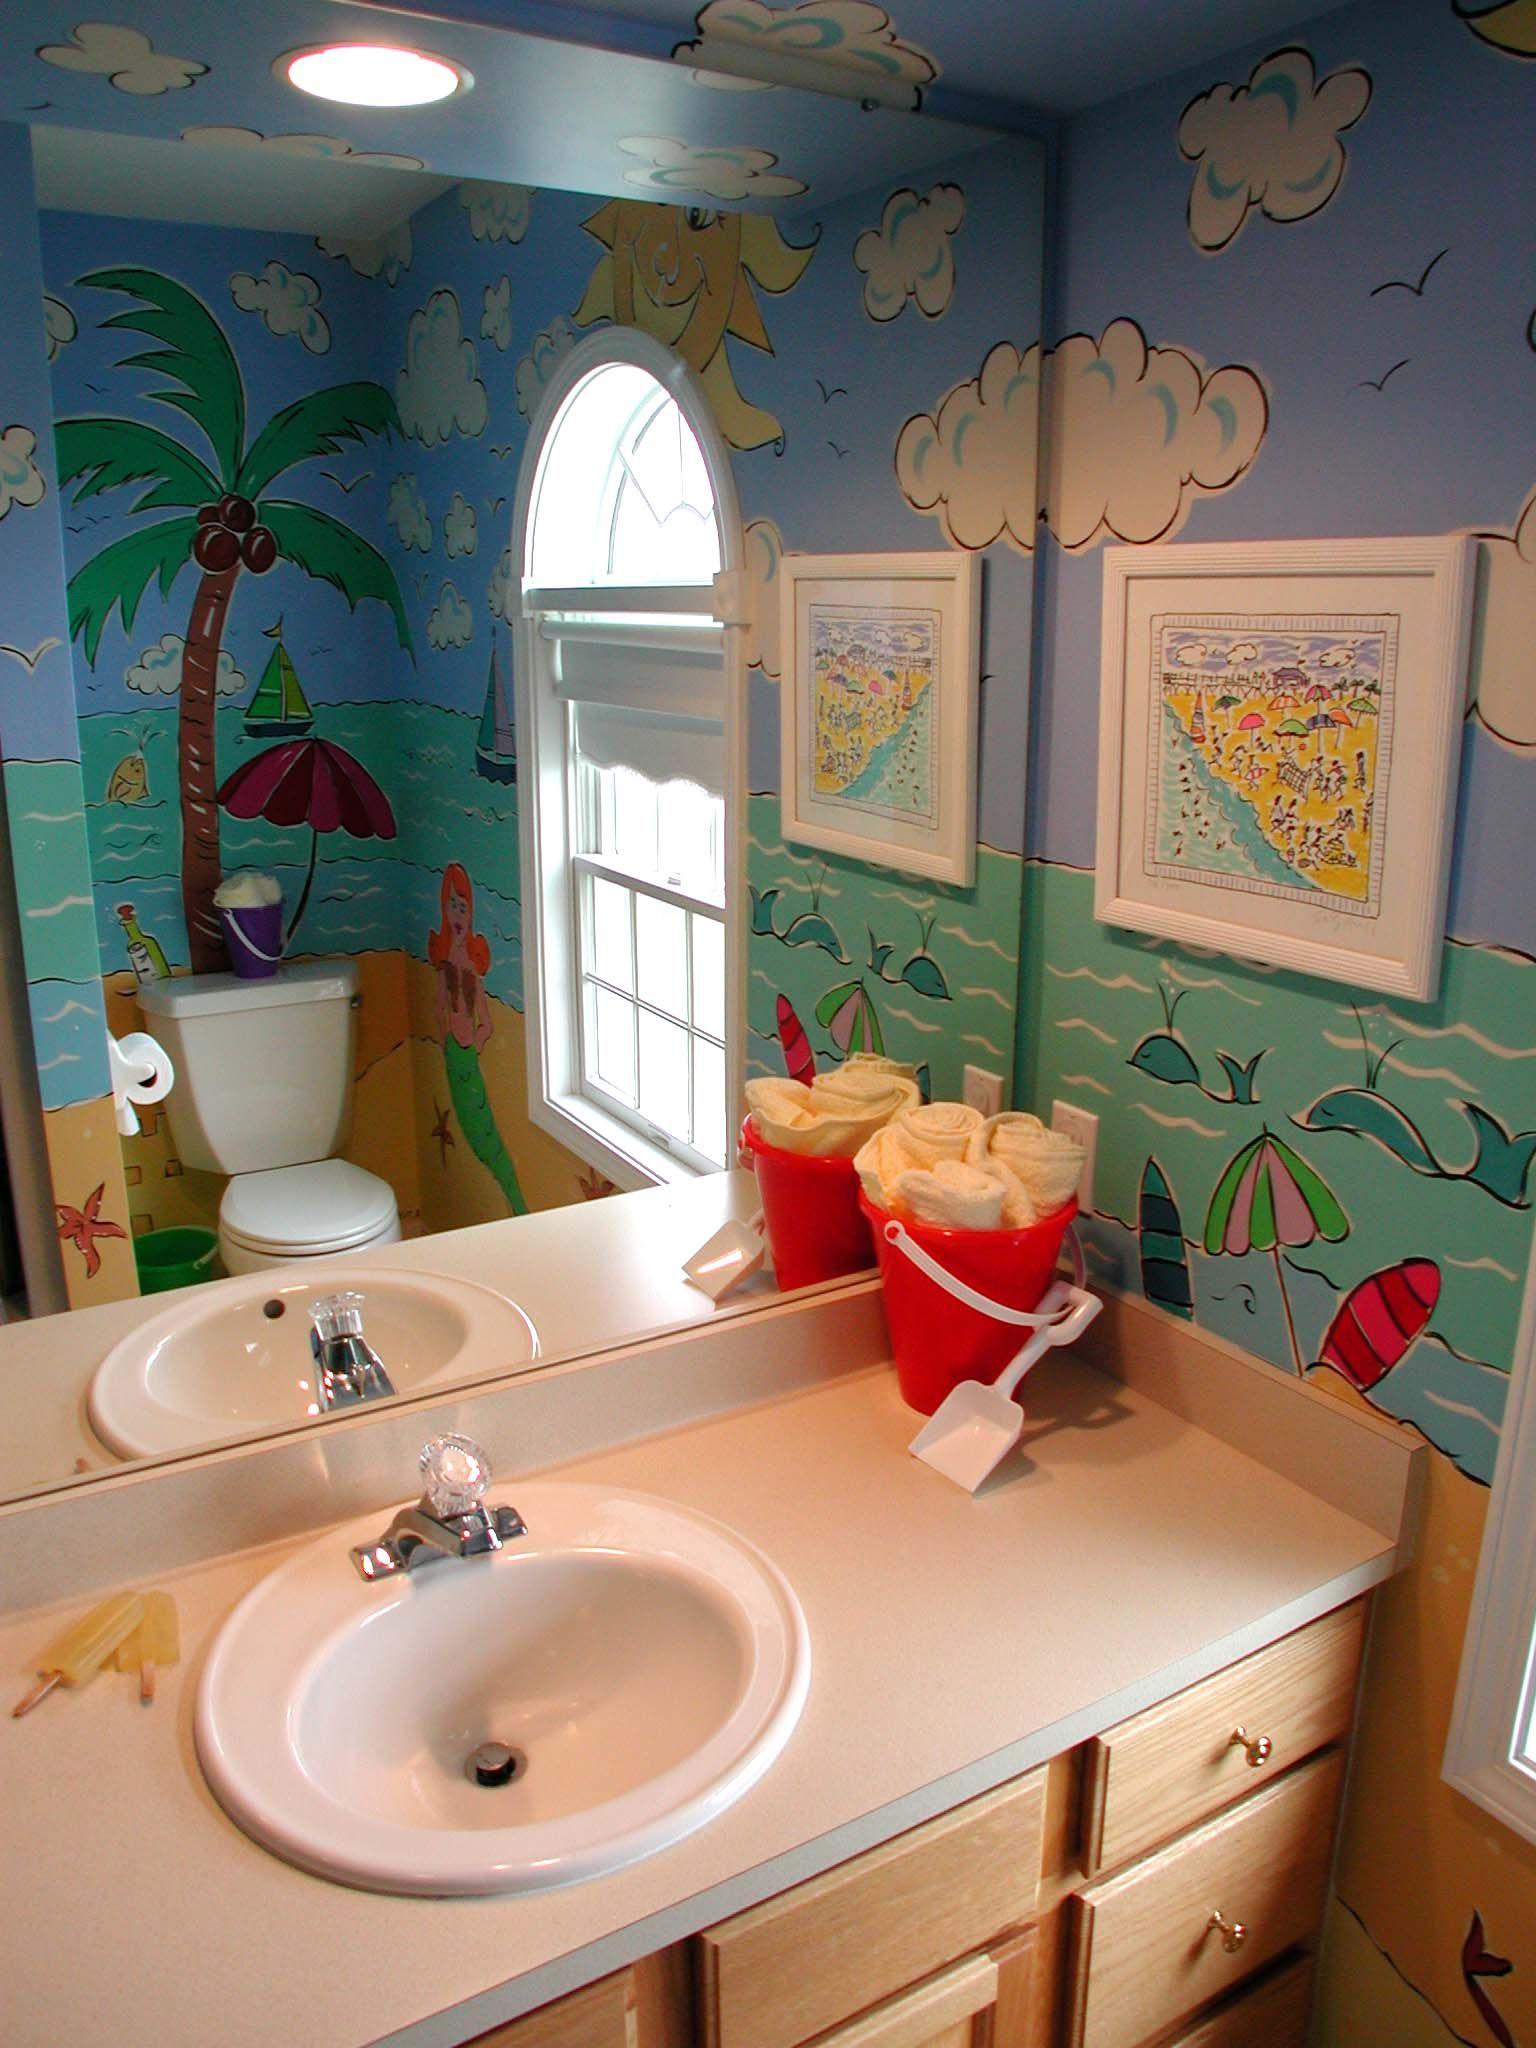 Beach themed mural in a kids bathroom Sky Surf and sand